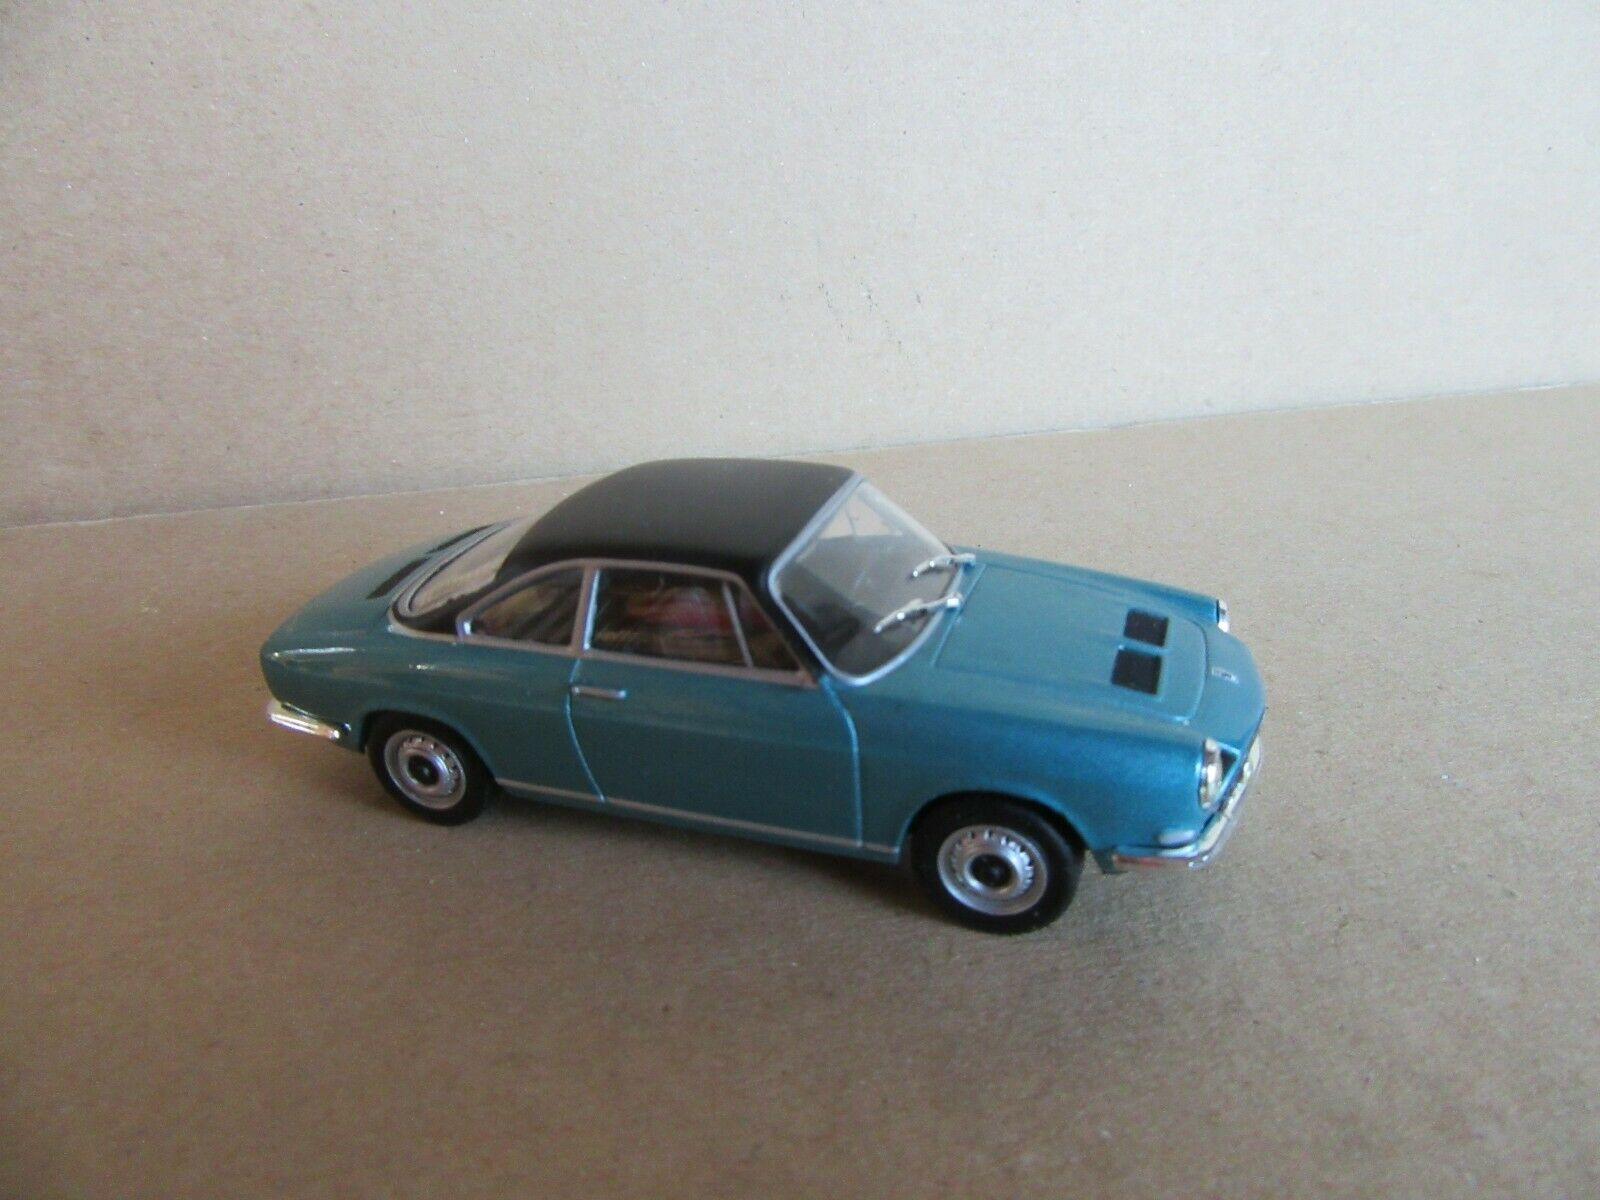 276I IXO Altaya 71 Simca 1200S 1971 Coupé 1 43